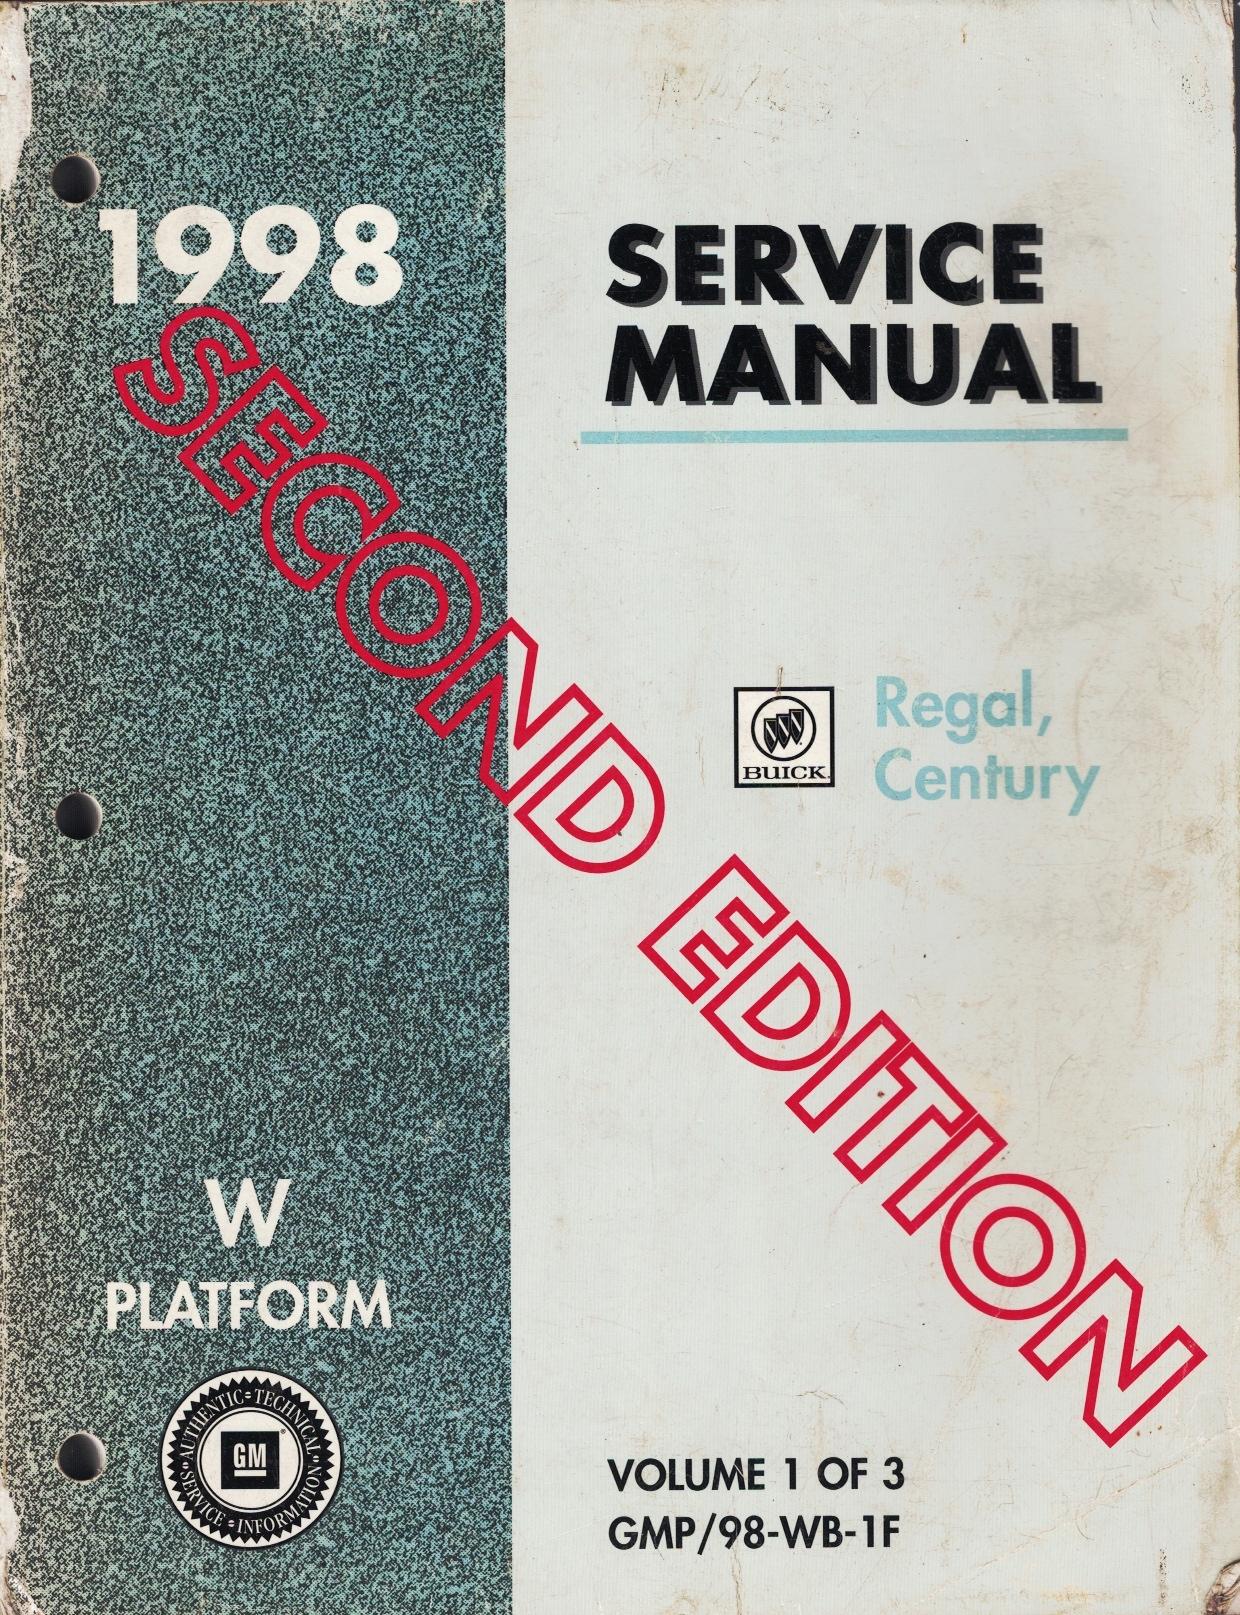 Image for 1998 W-Platform - Buick Regal, Century Service Manual (3 Volume Set) (Second Edition)